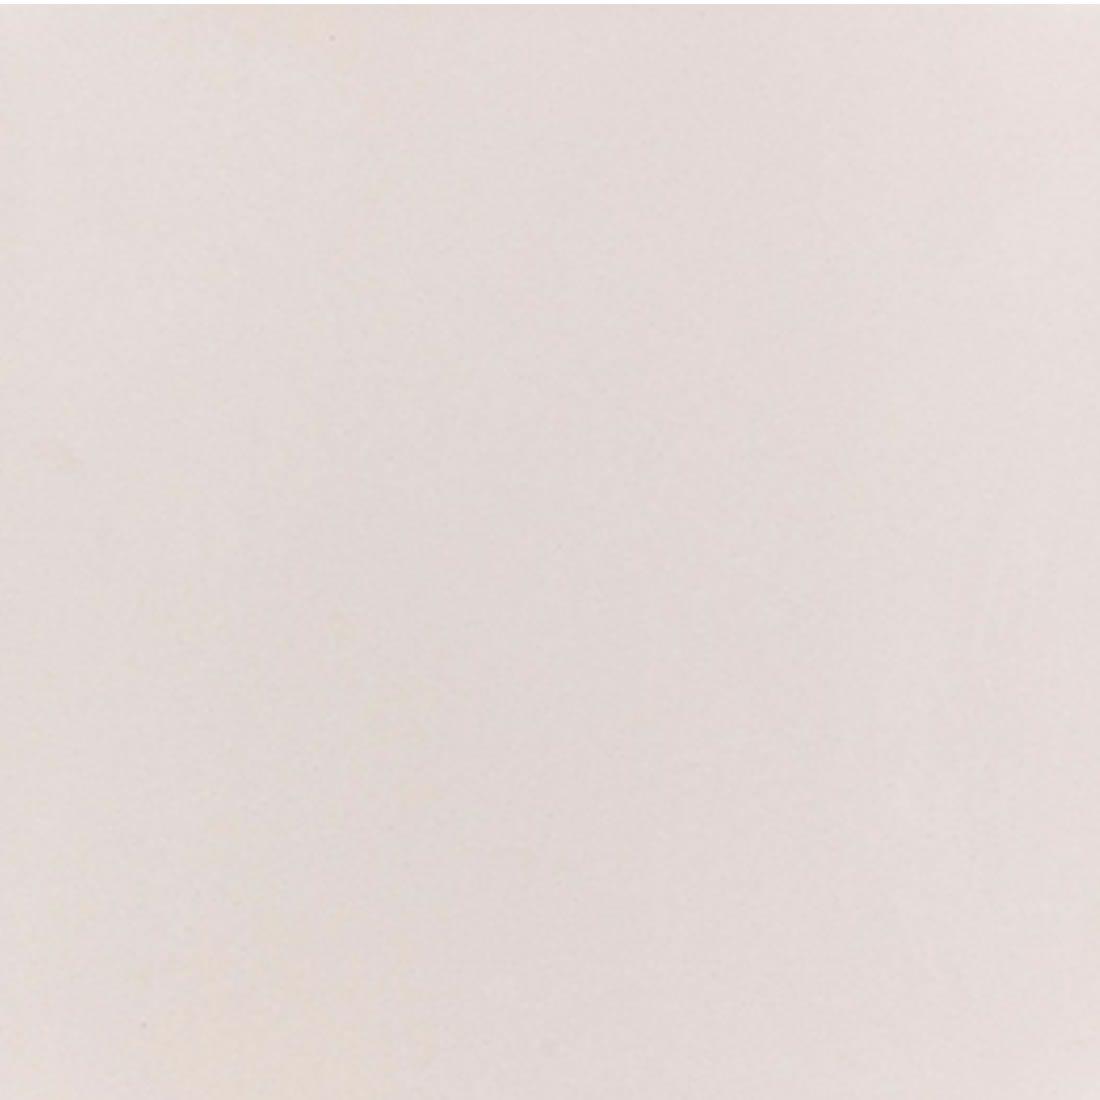 Porcelanato Polido Interno Borda Reta 62,5 x 62,5cm Super Bianco Polido Elizabeth